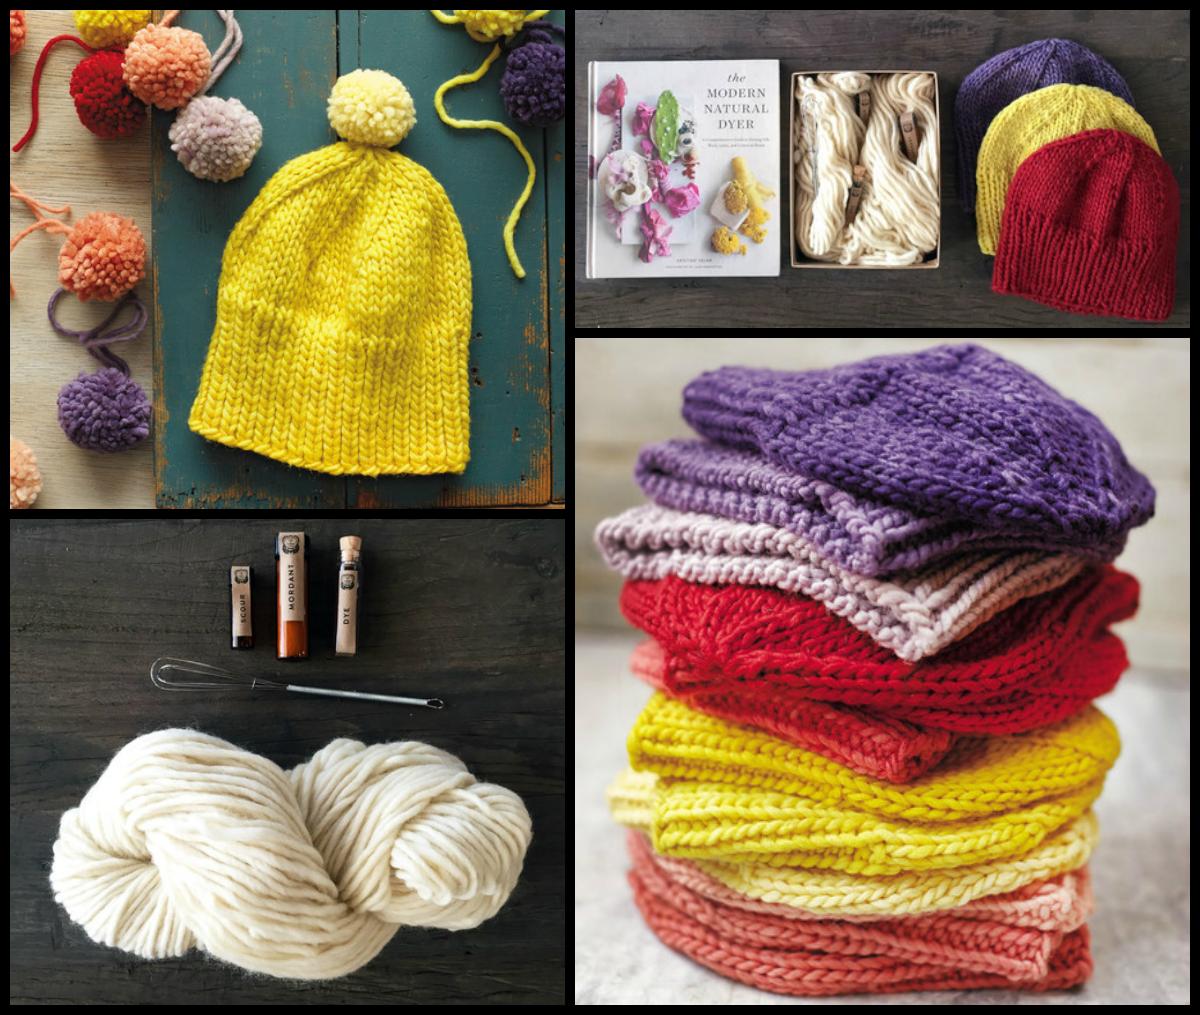 Northwoods Hat Dye Kit